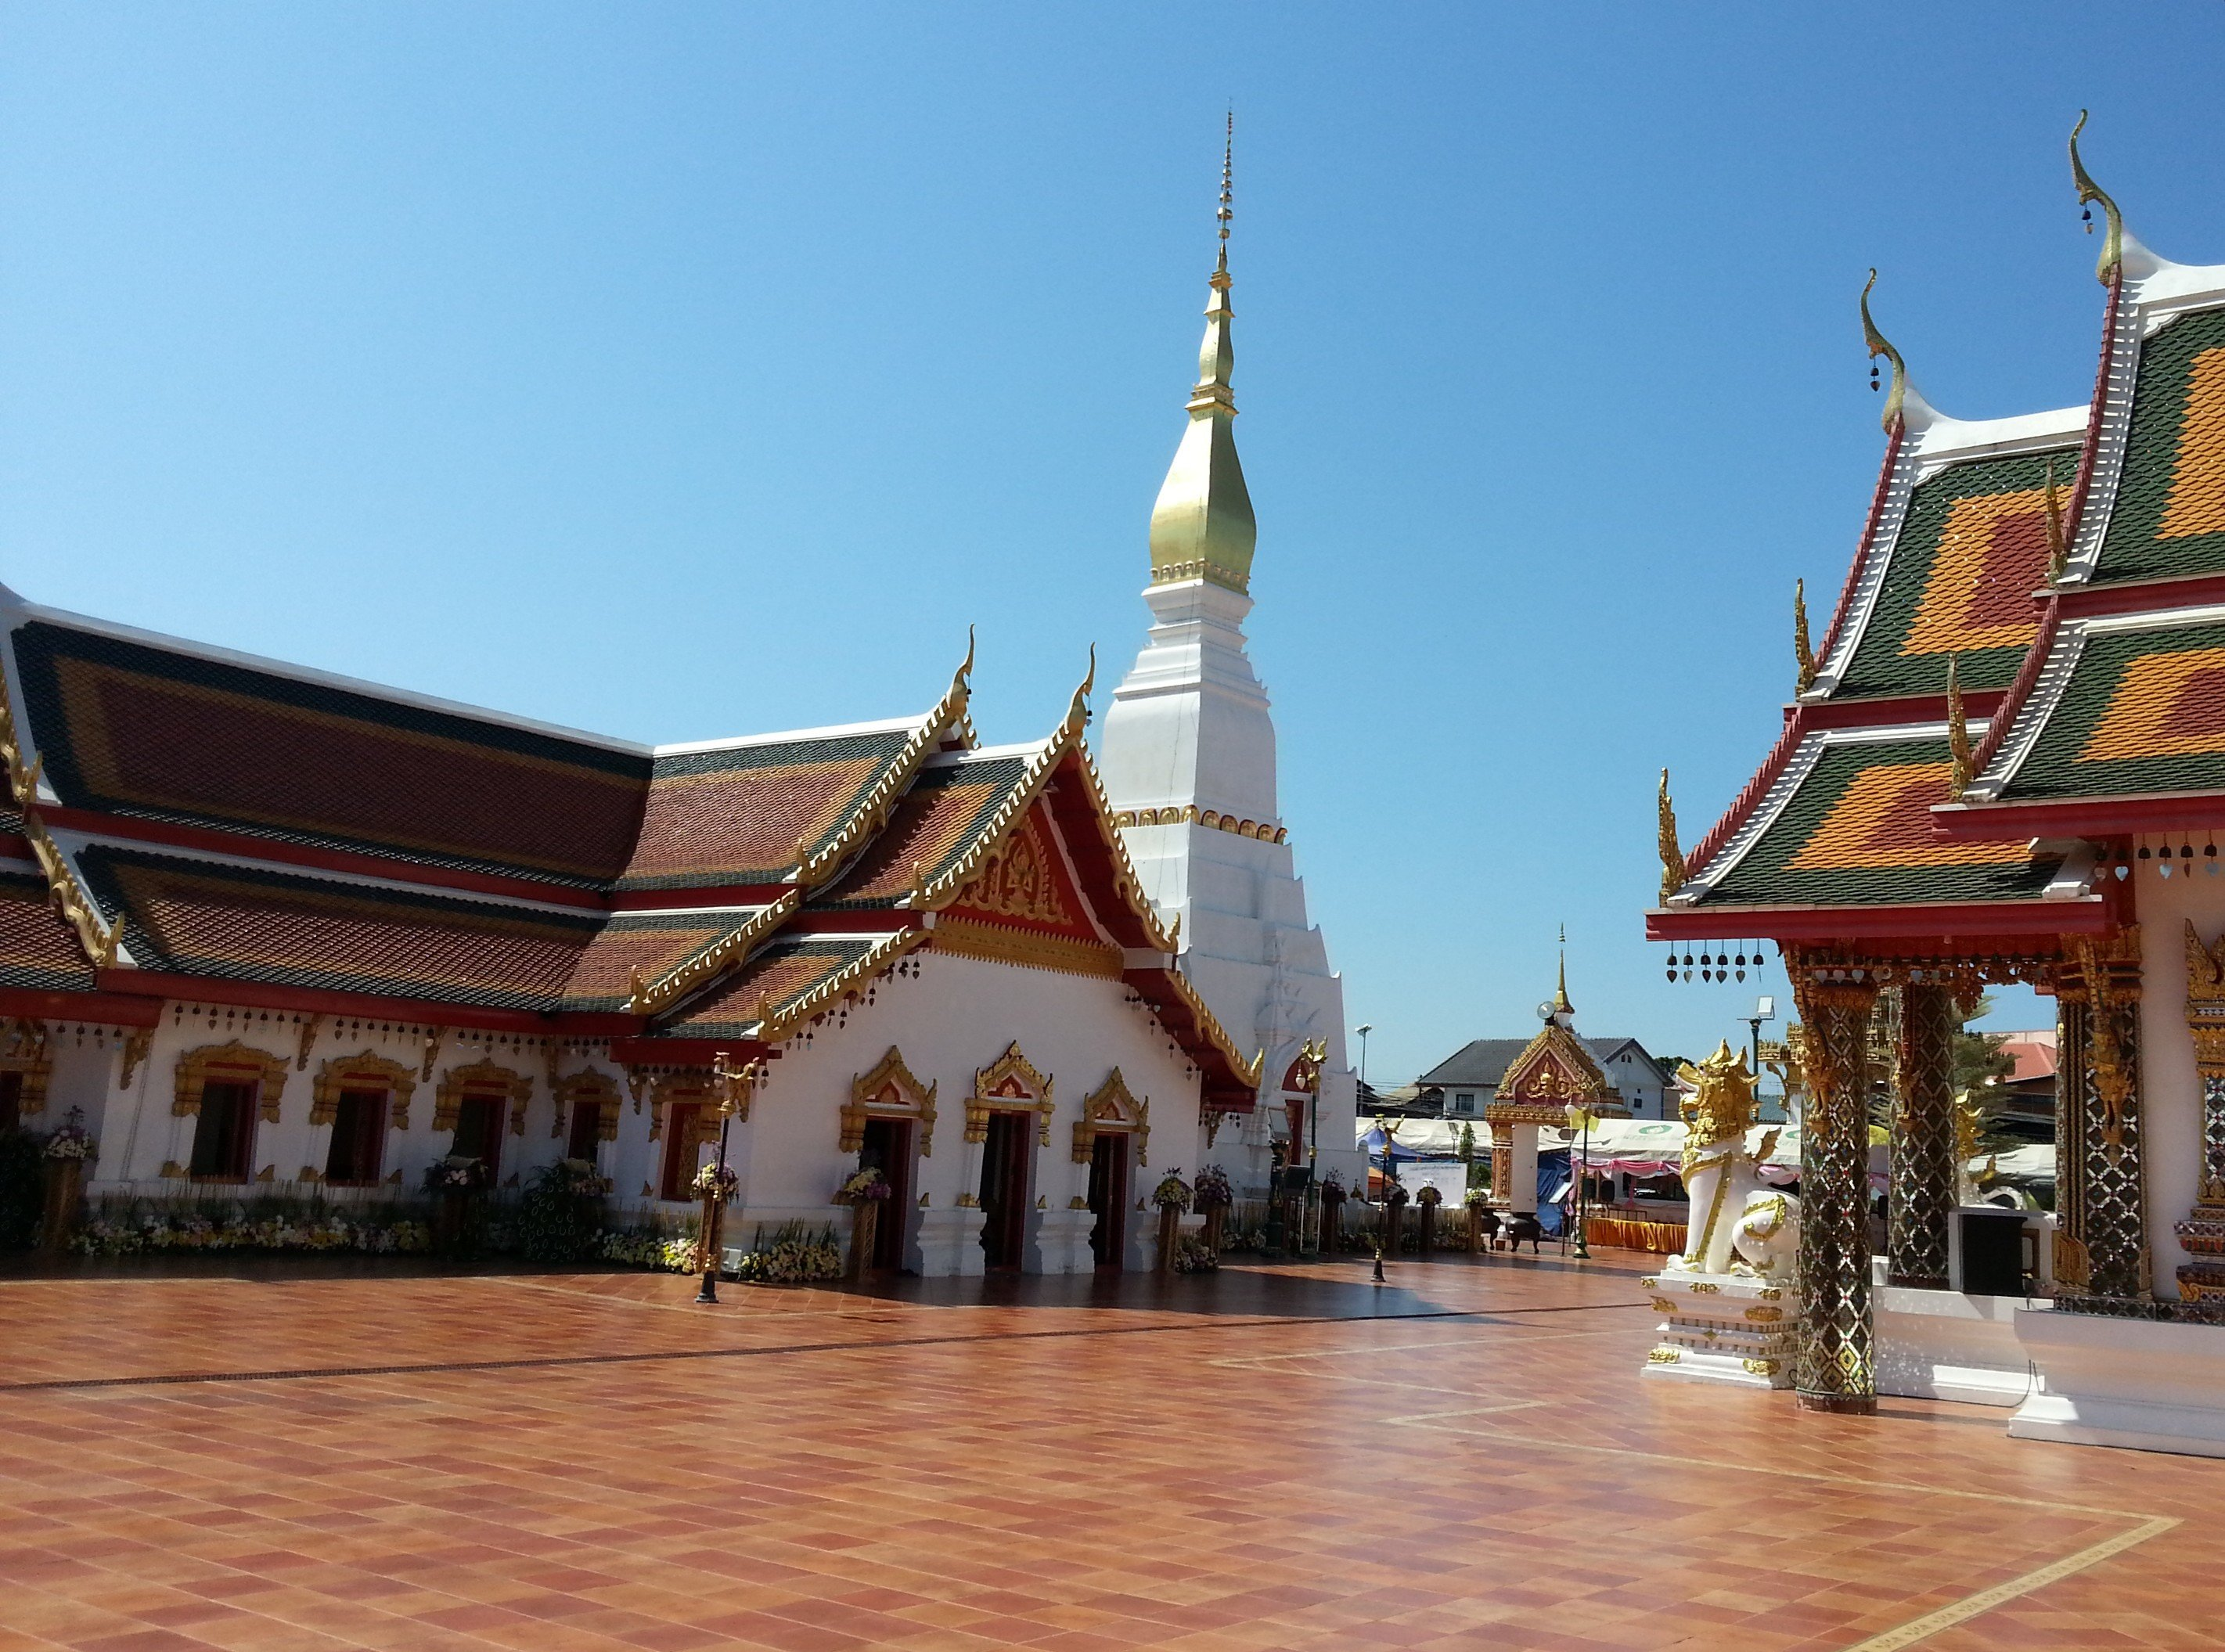 Wat Phra That Choeng Chum in Sakoh Nakhon